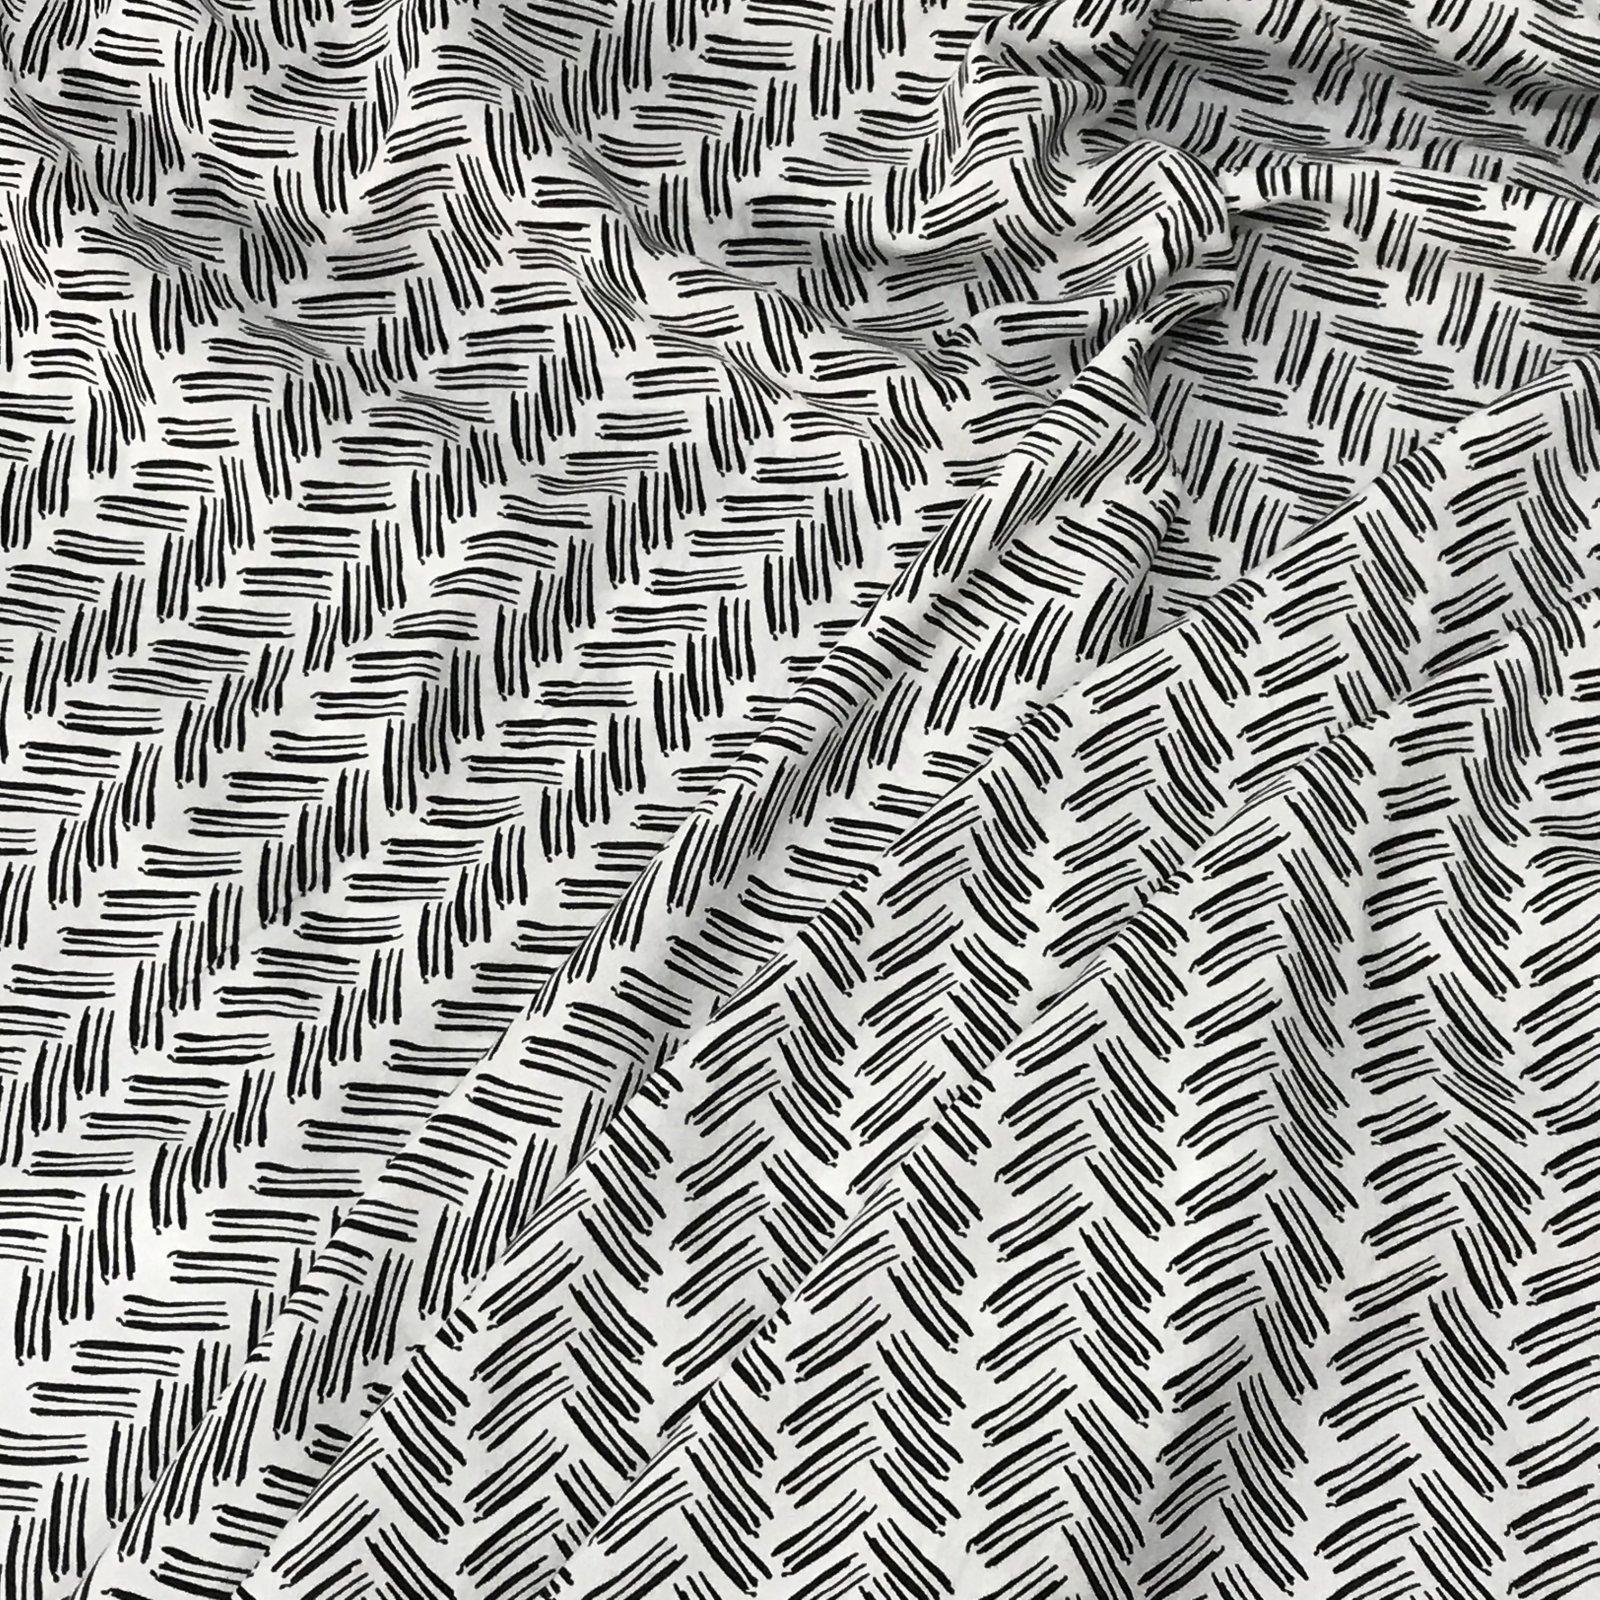 Rayon - Ecru & Black Lines